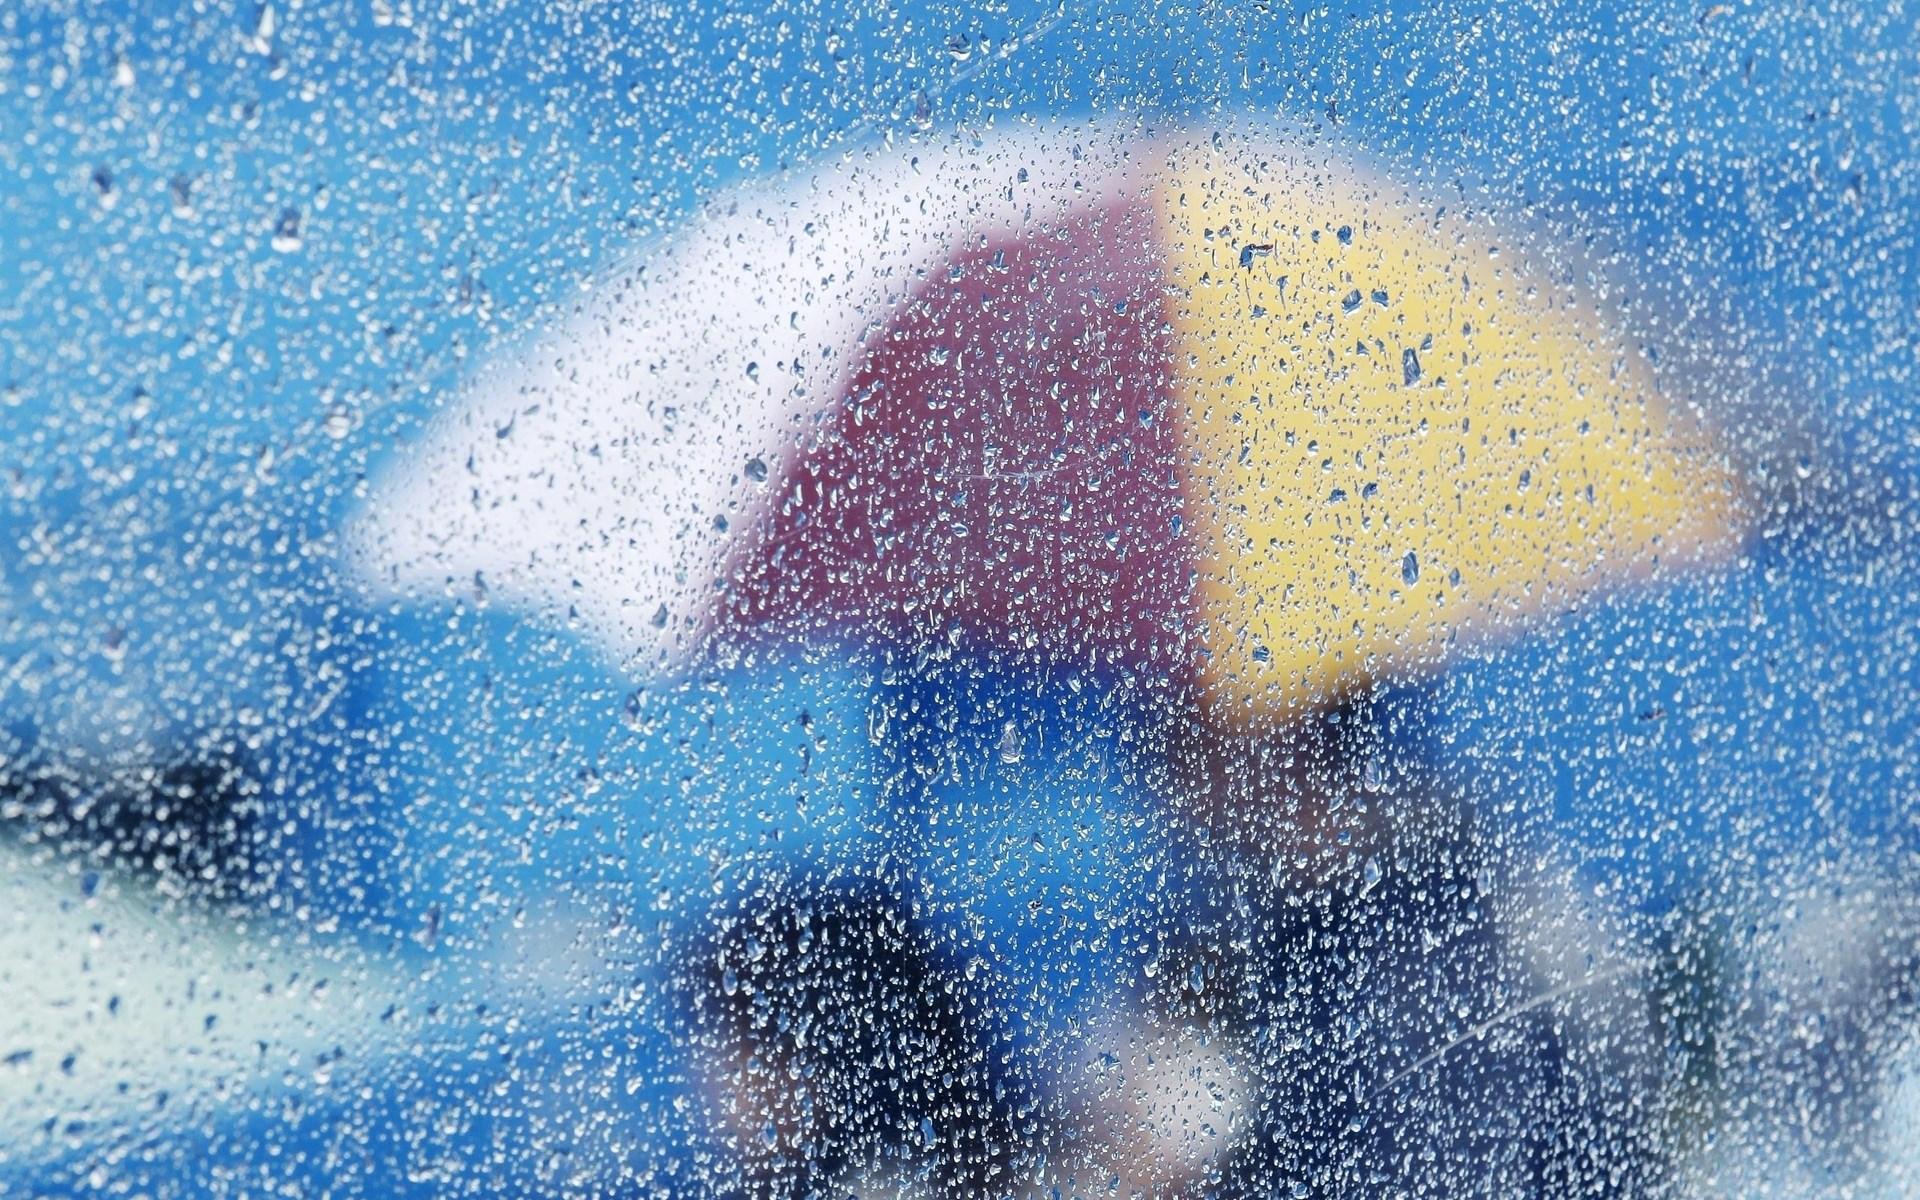 Rain Wallpapers Hd